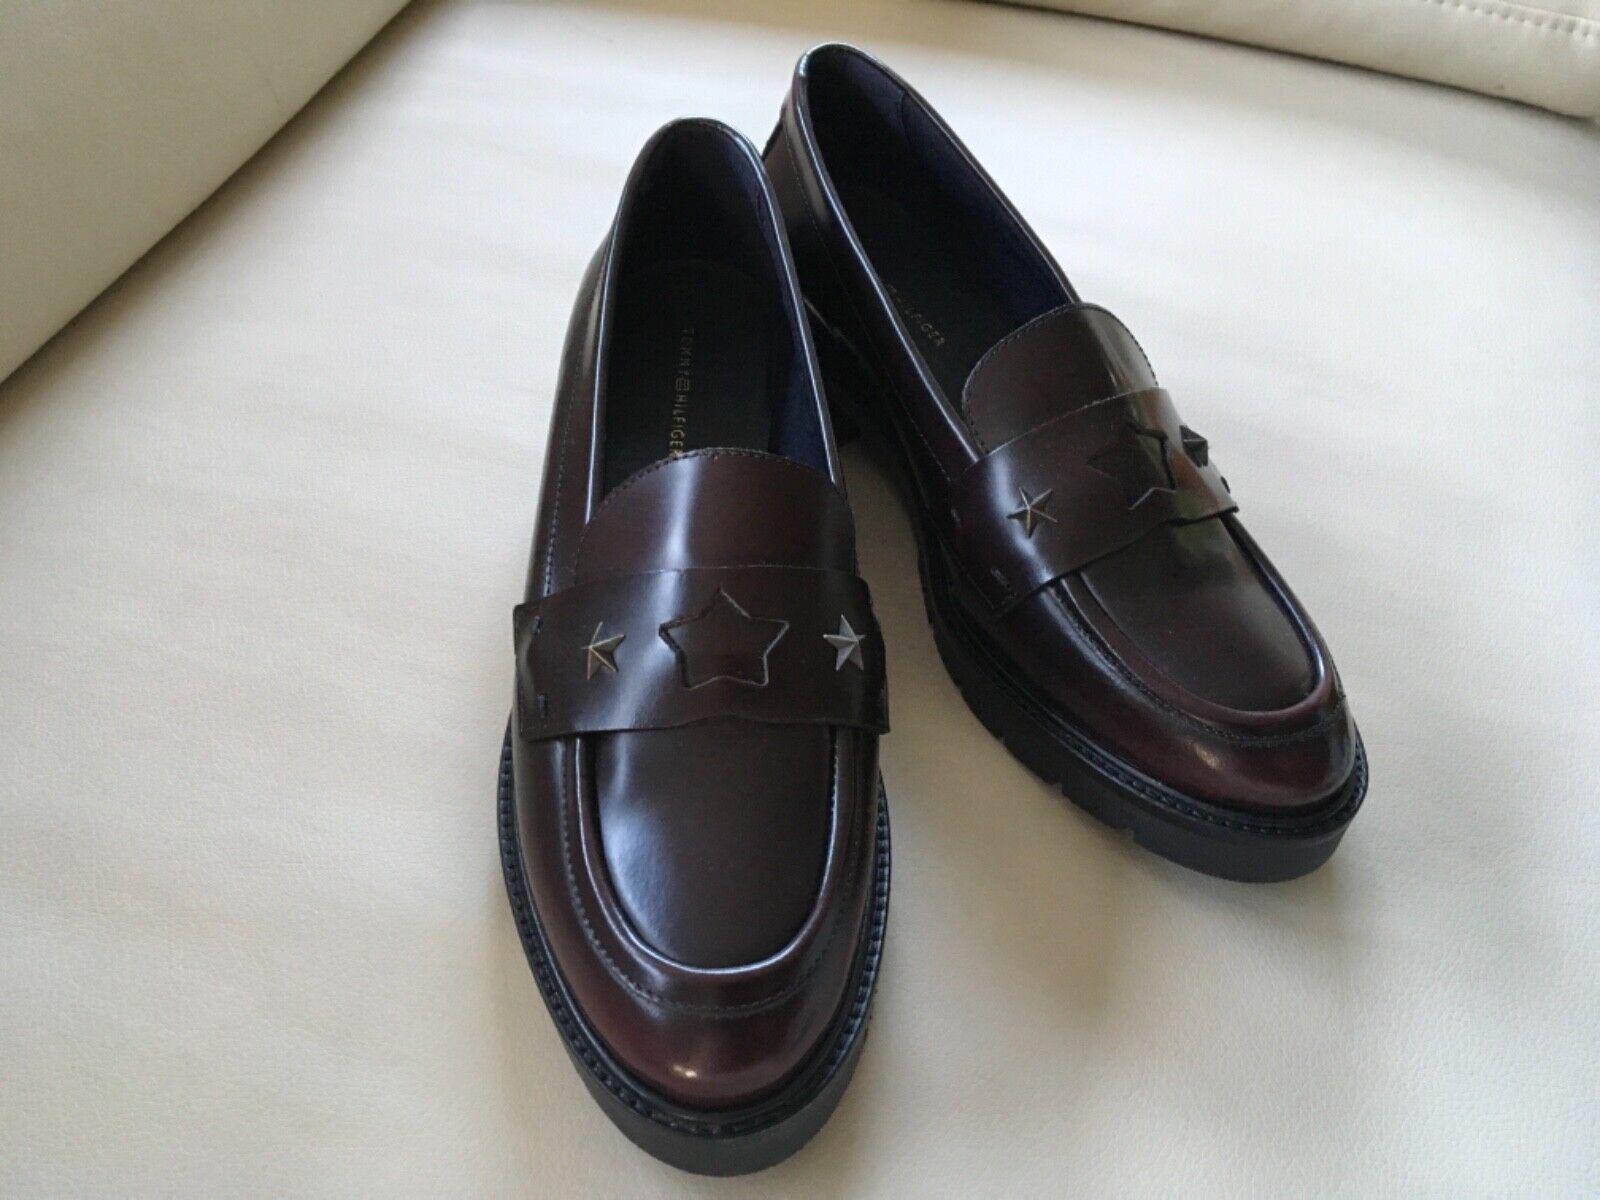 Tommy Hilfiger Damen Schuhe, Gr.39, Neu  | Merkwürdige Form